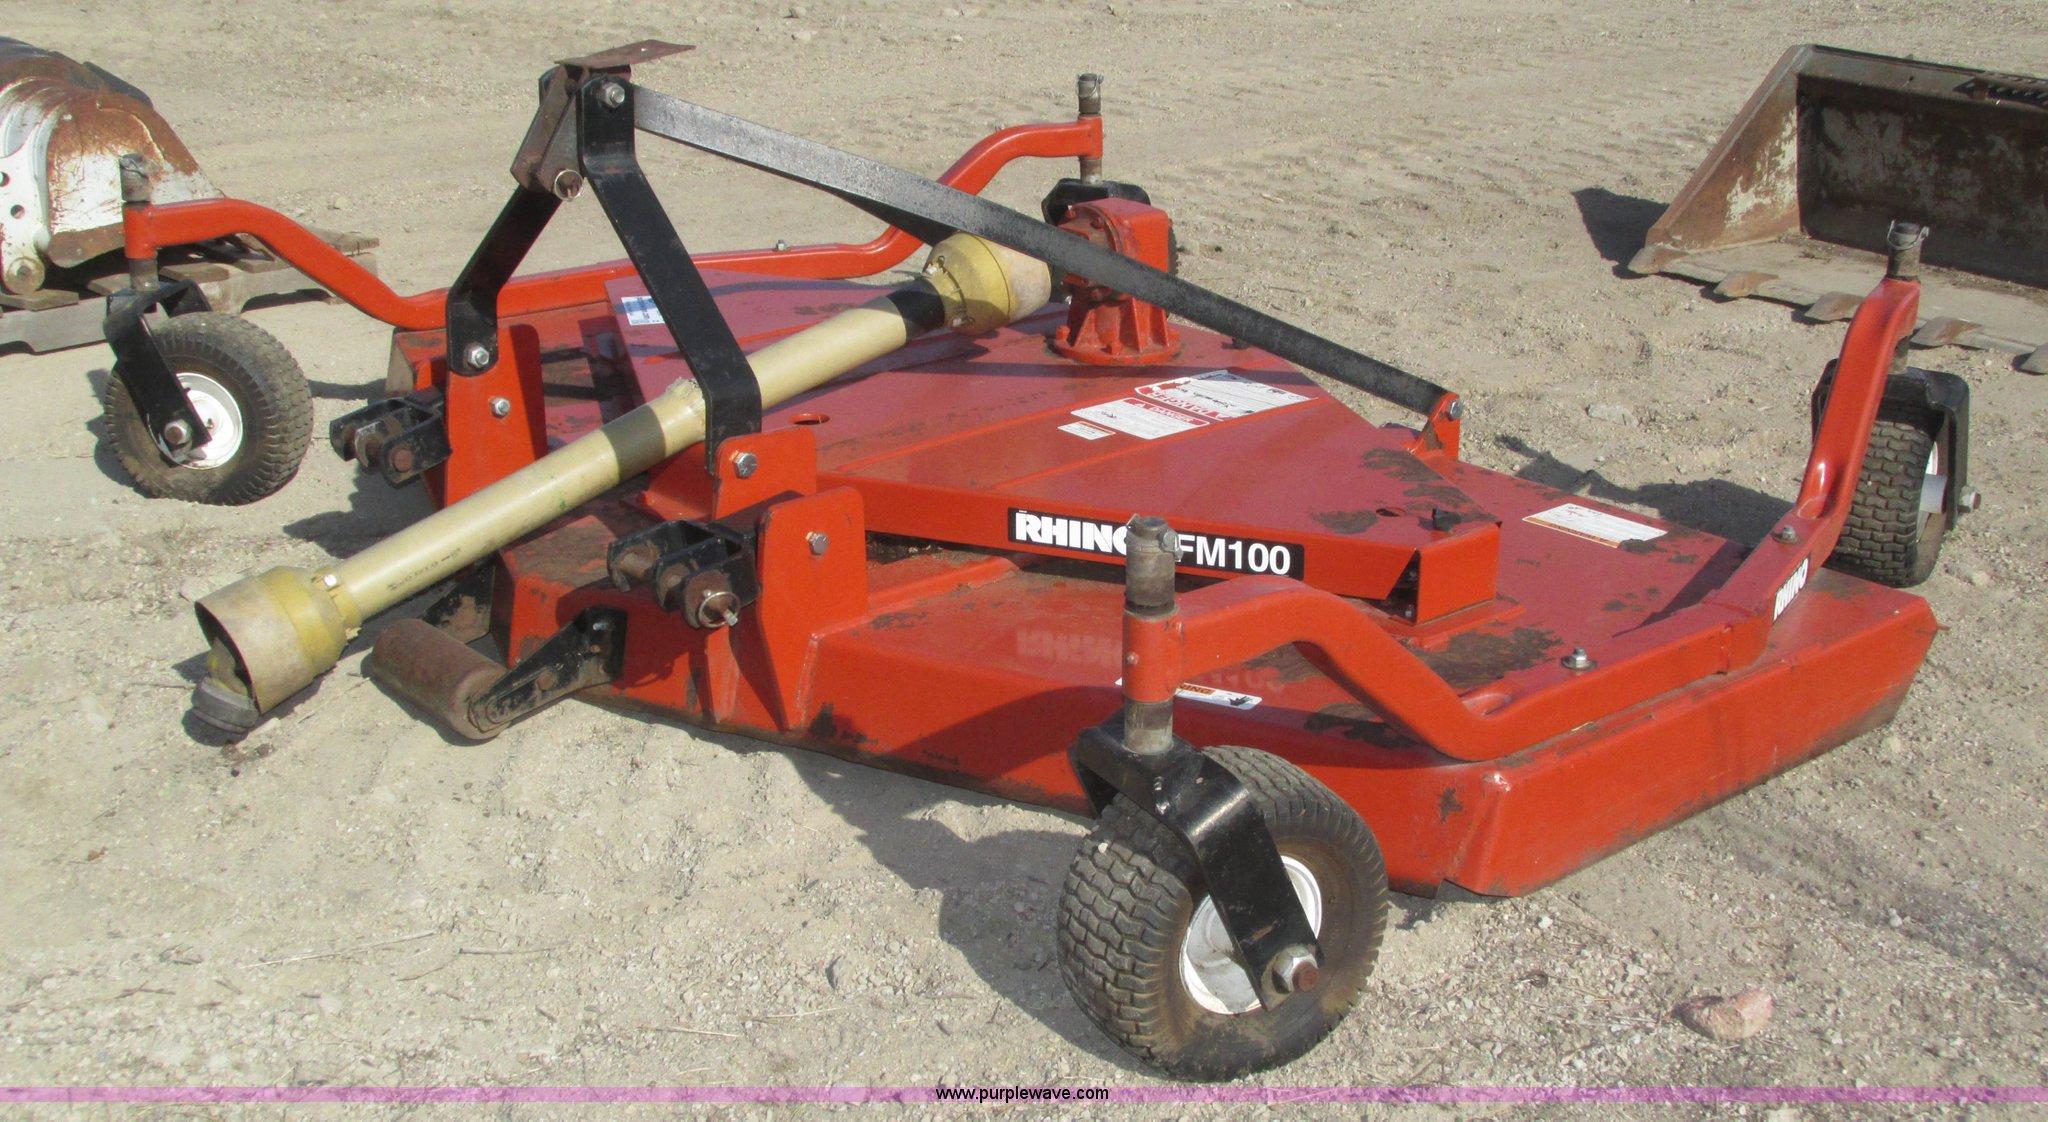 Rhino FM100 finish mower | Item H1058 | SOLD! December 17 Co